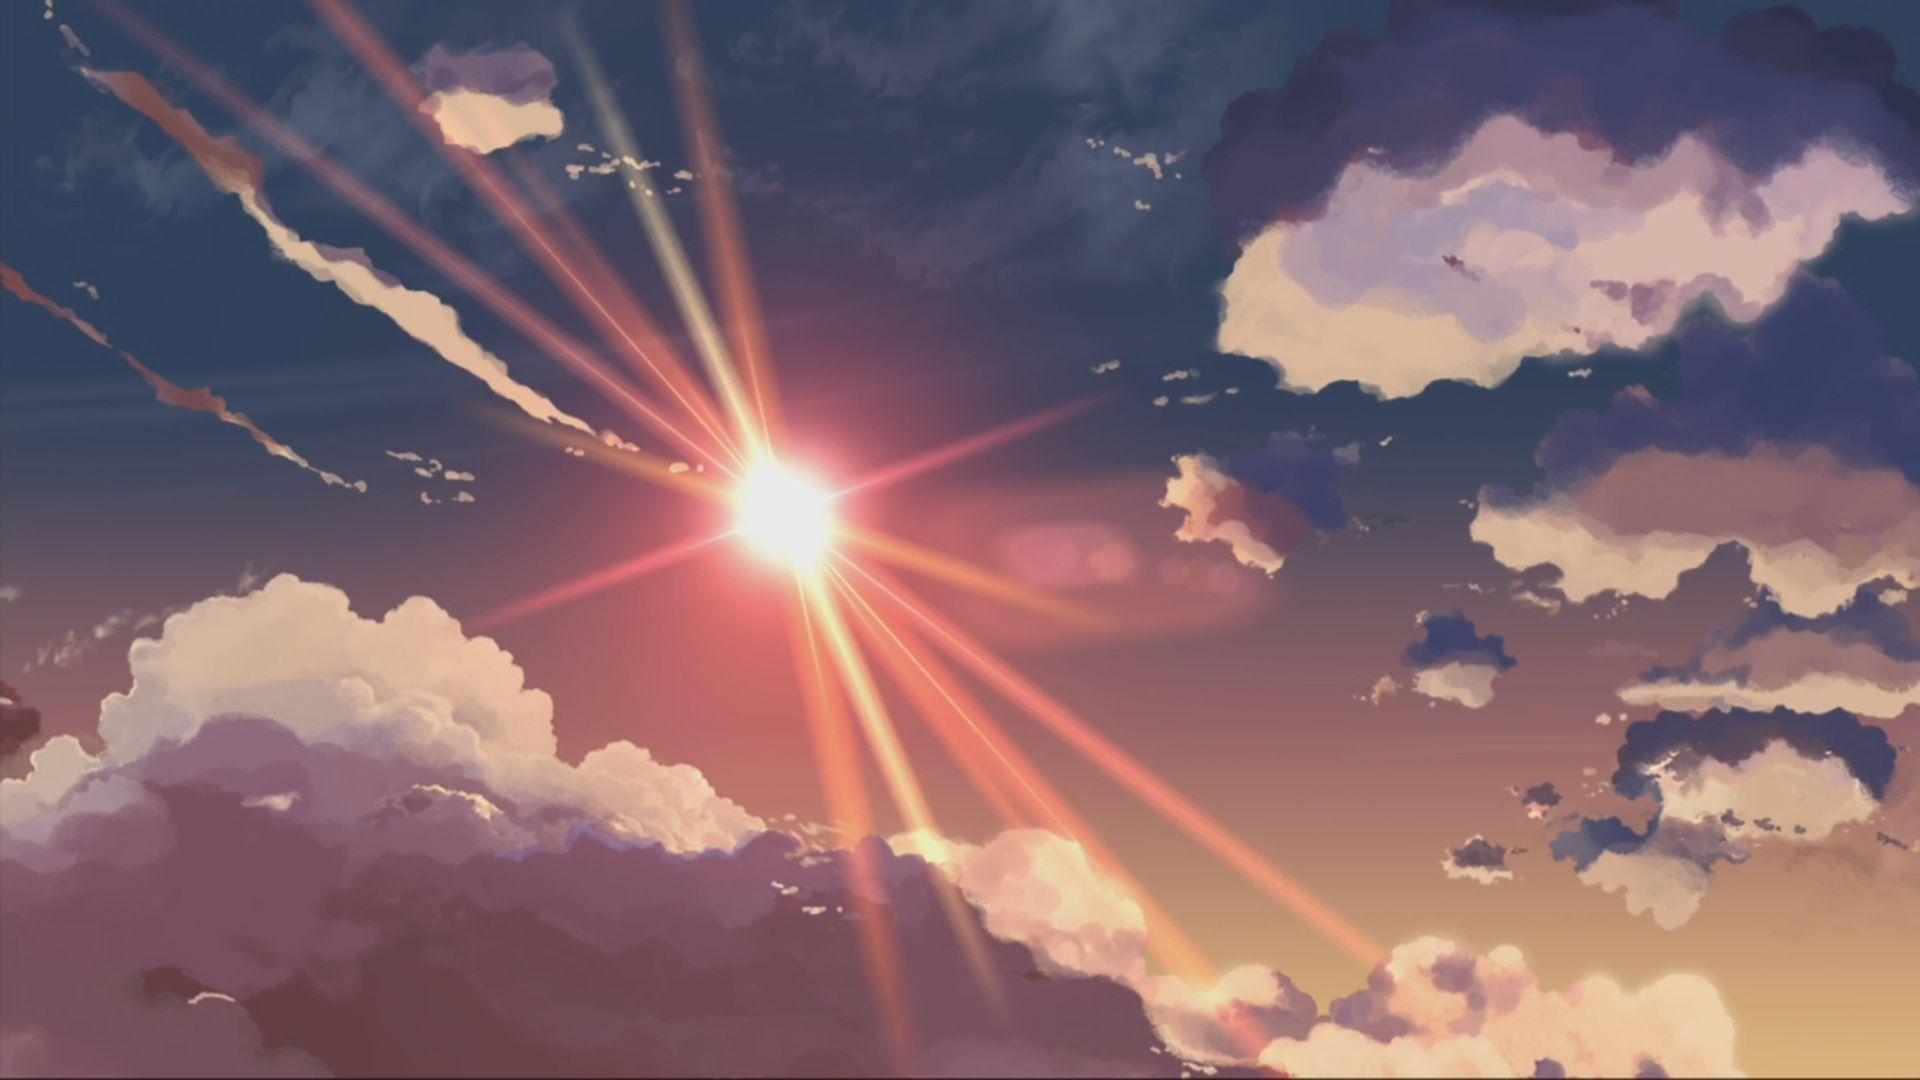 anime city scenery wallpaper